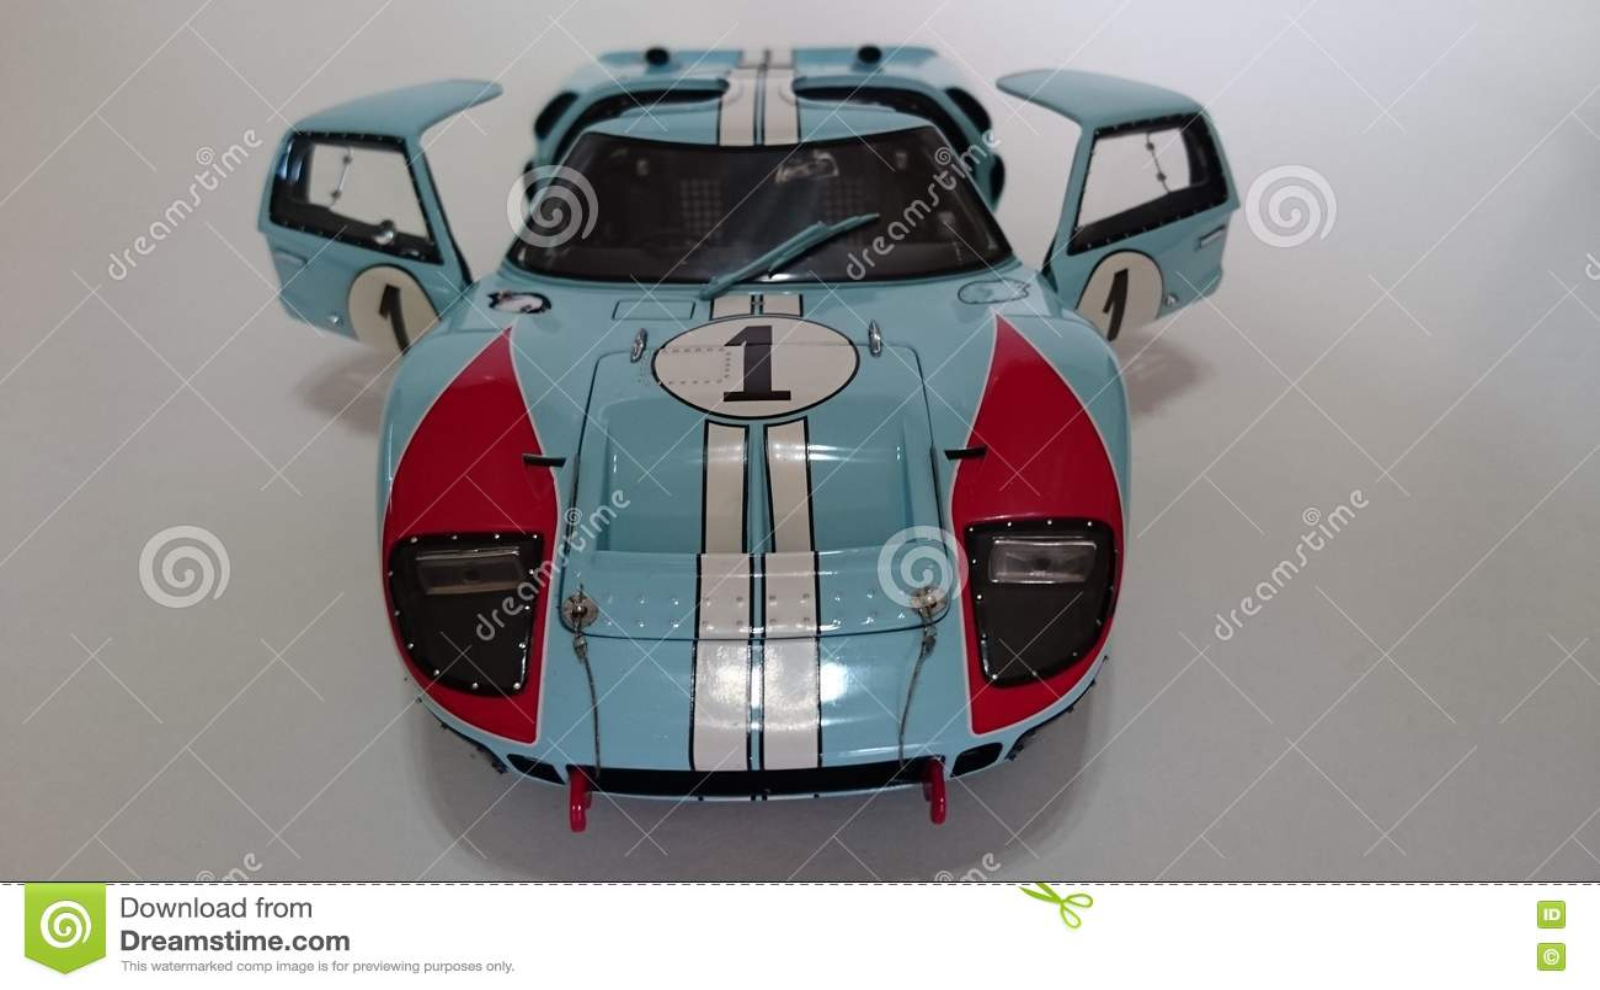 Cast Replica Of A Famous Racer Of Lemans